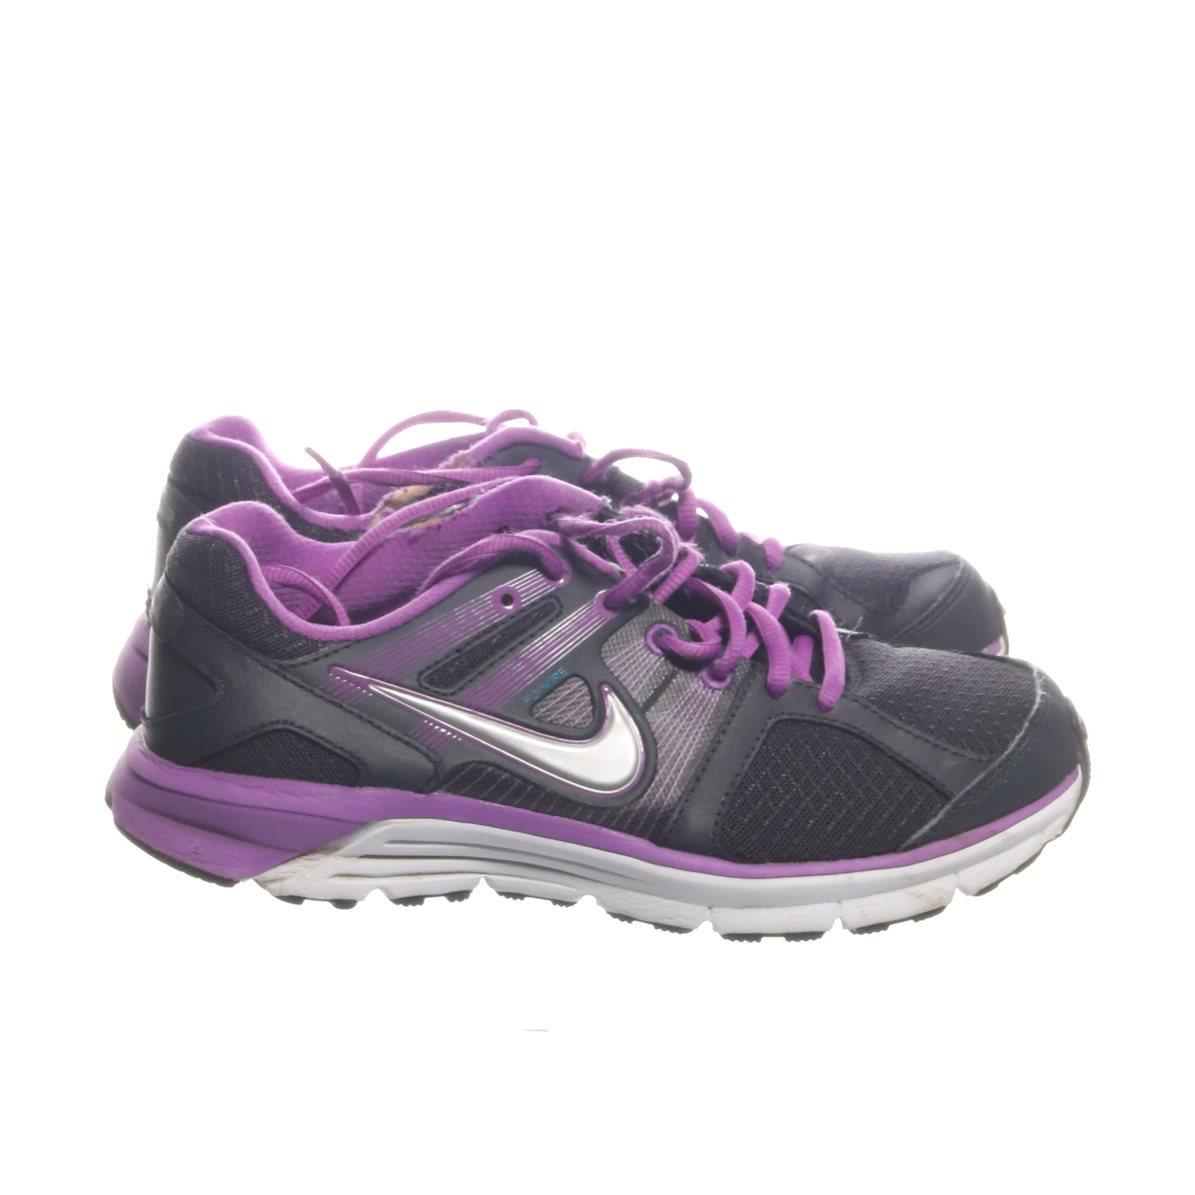 uk availability 729c9 0f32d Nike, Sneakers, Strl  38, ANODYNE DS, Svart Lila